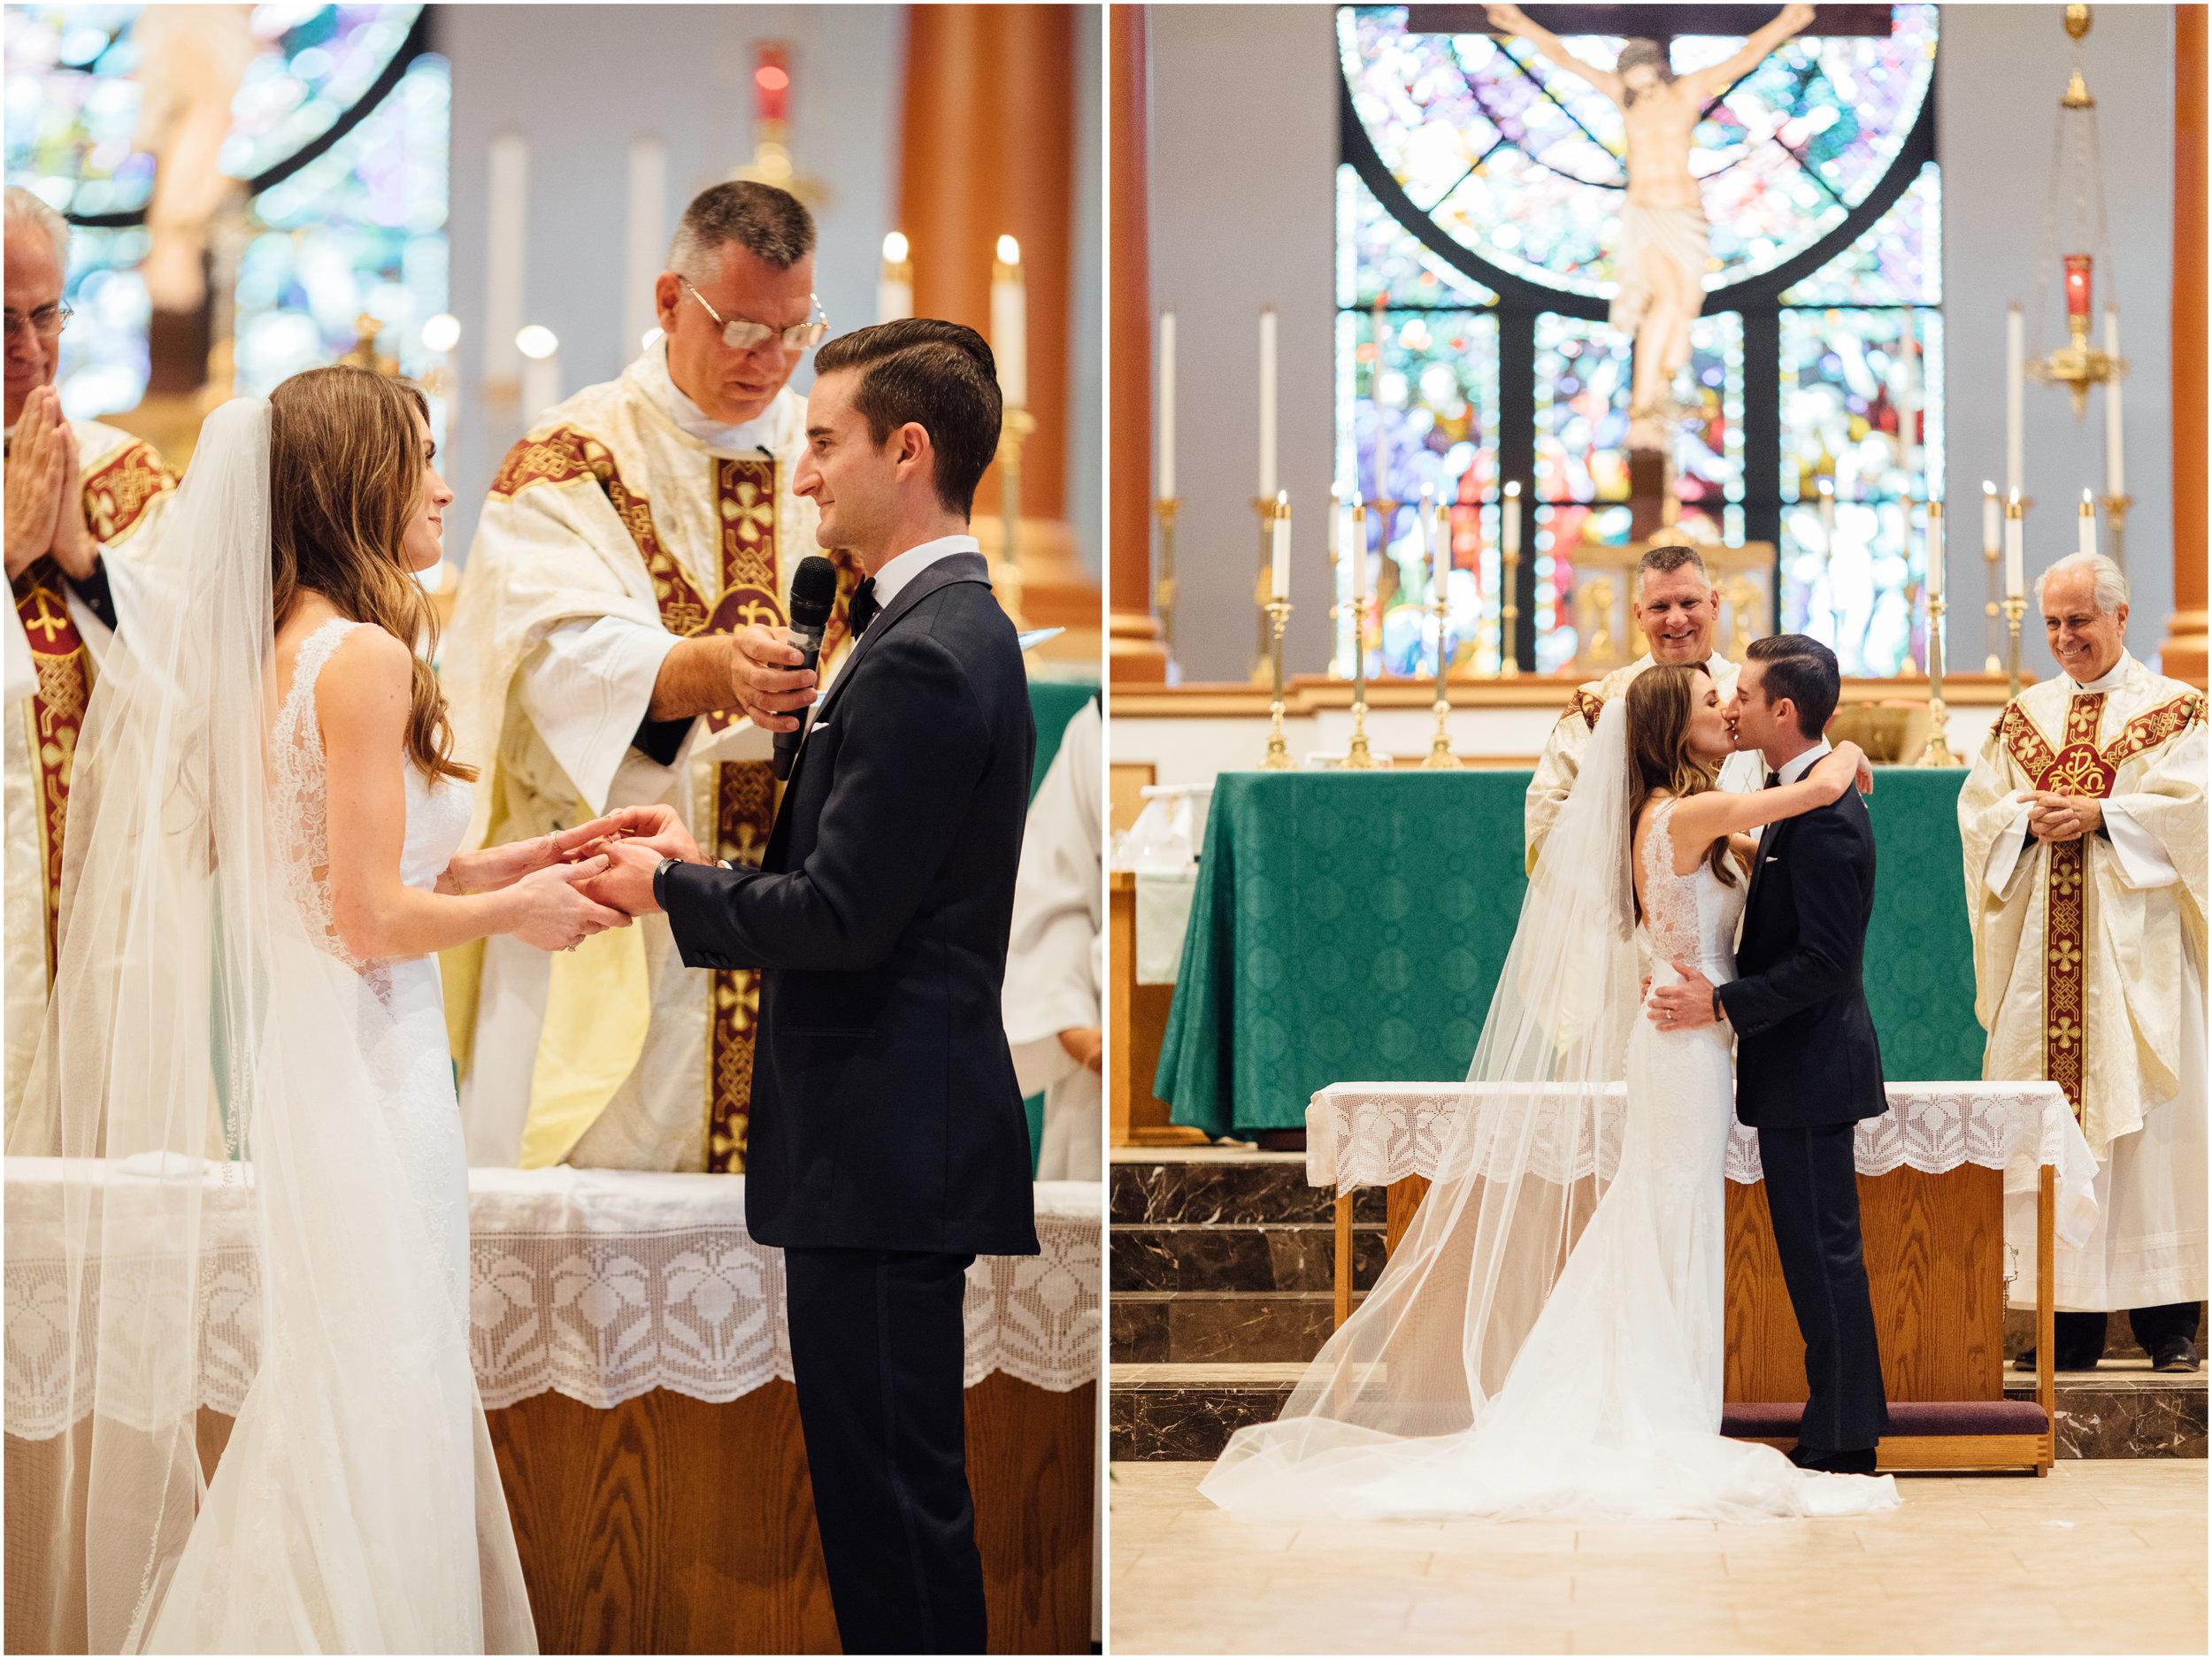 Vows-catholic-wedding.jpg